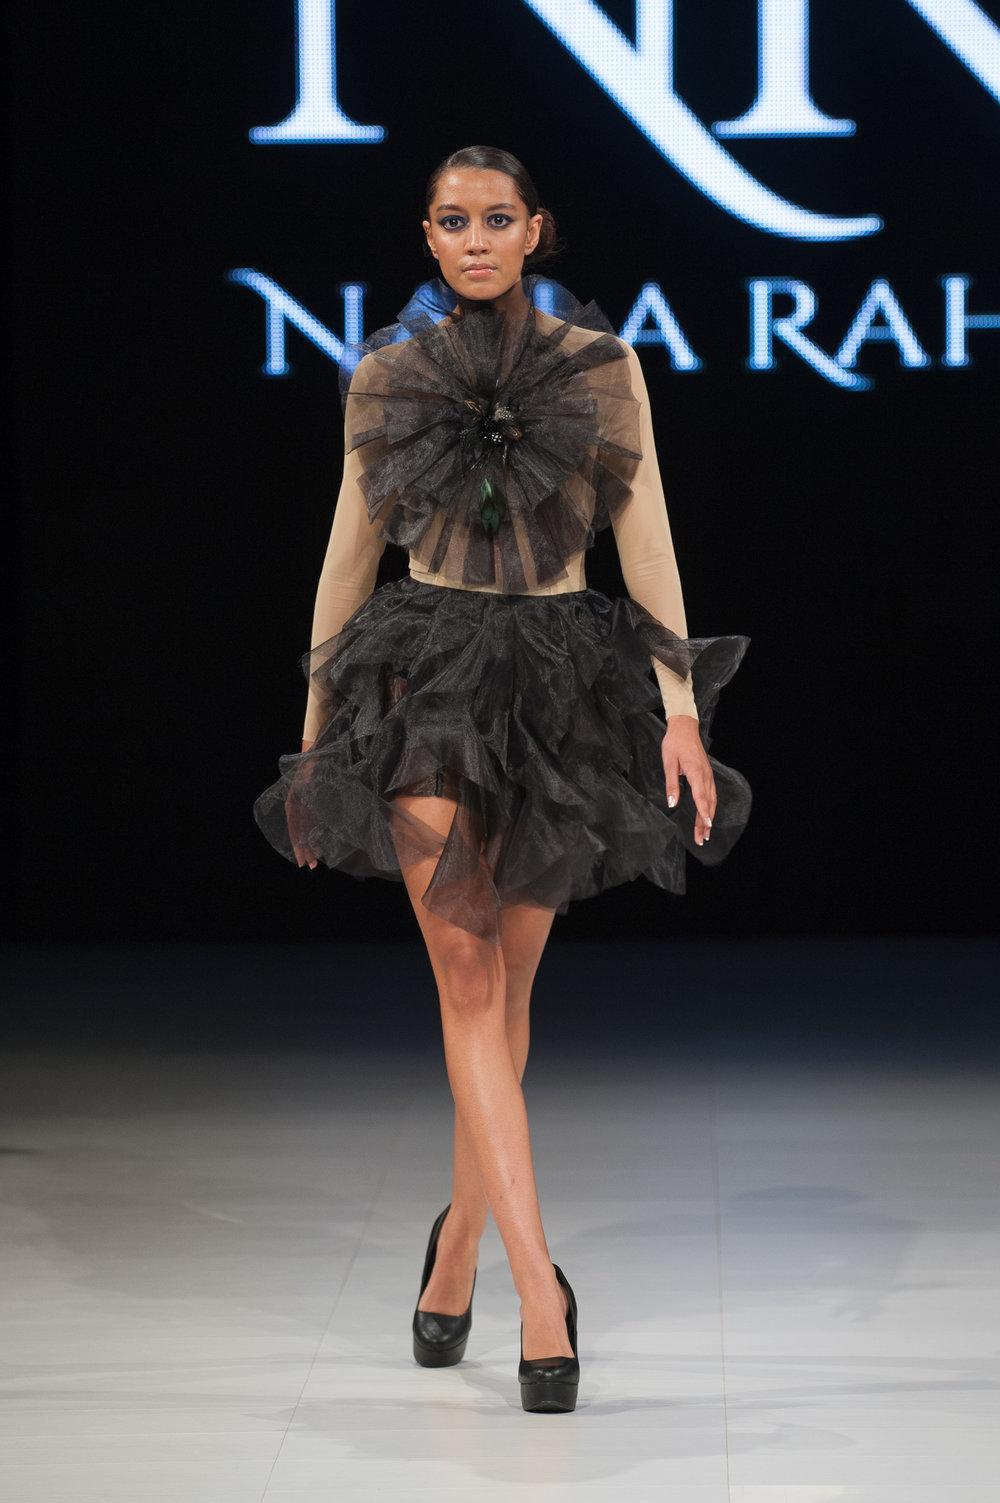 FAT2018-Day1-April17-Najla_Rahimi-Runway-Che_Rosales-LARAWAN-6137.jpg